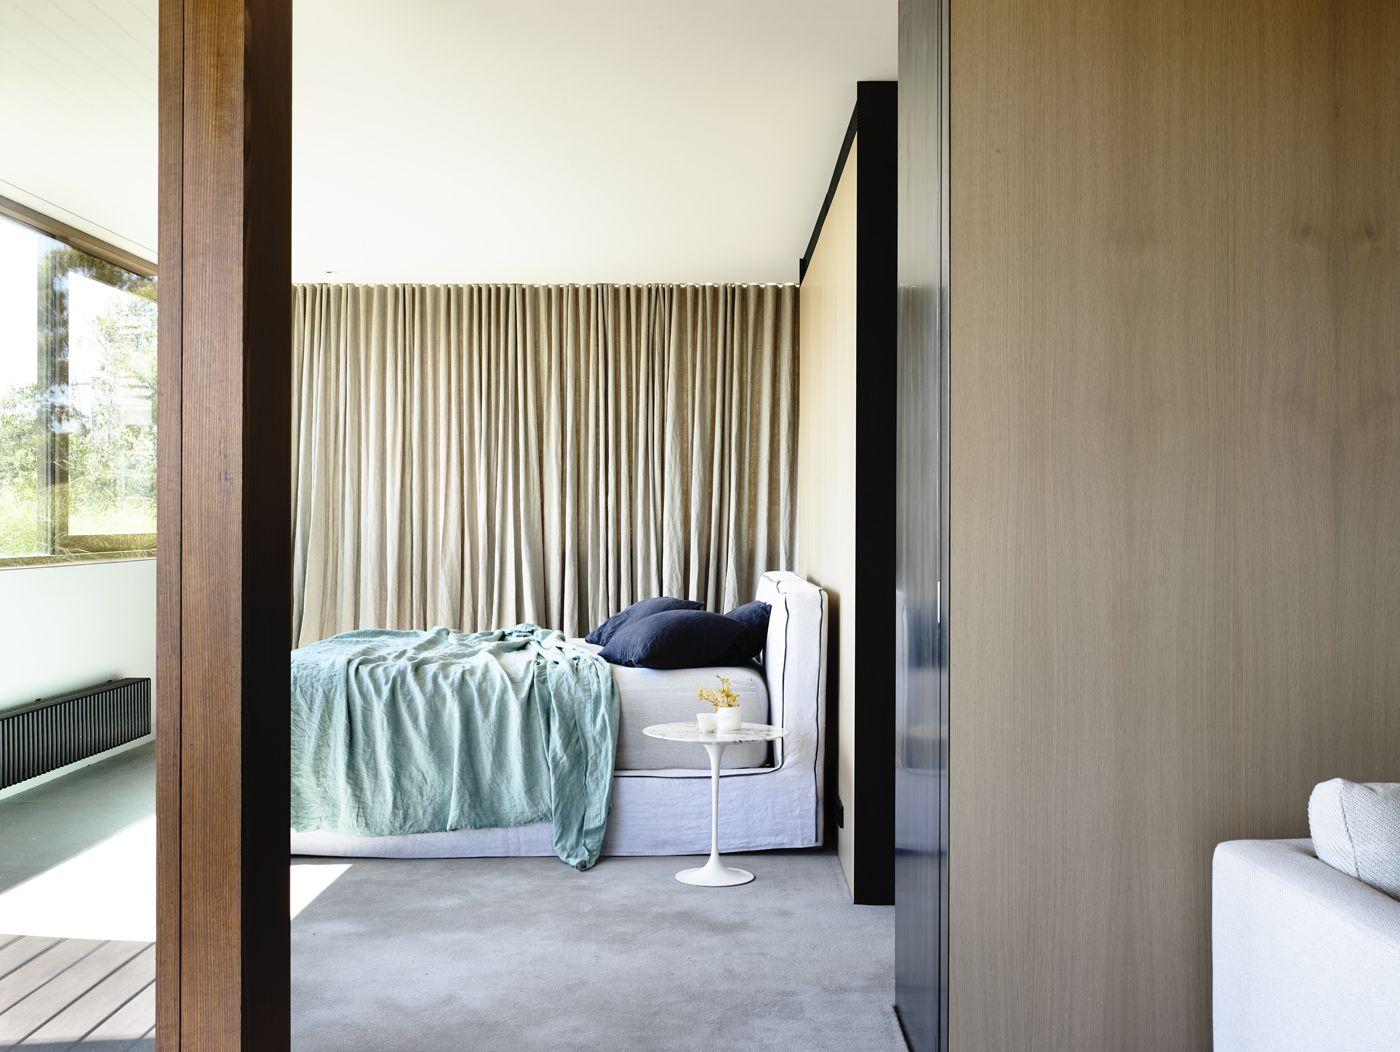 Slaapkamer Warme Kleuren : Slaapkamer inspiratie linnen zachte warme kleuren rob kennon